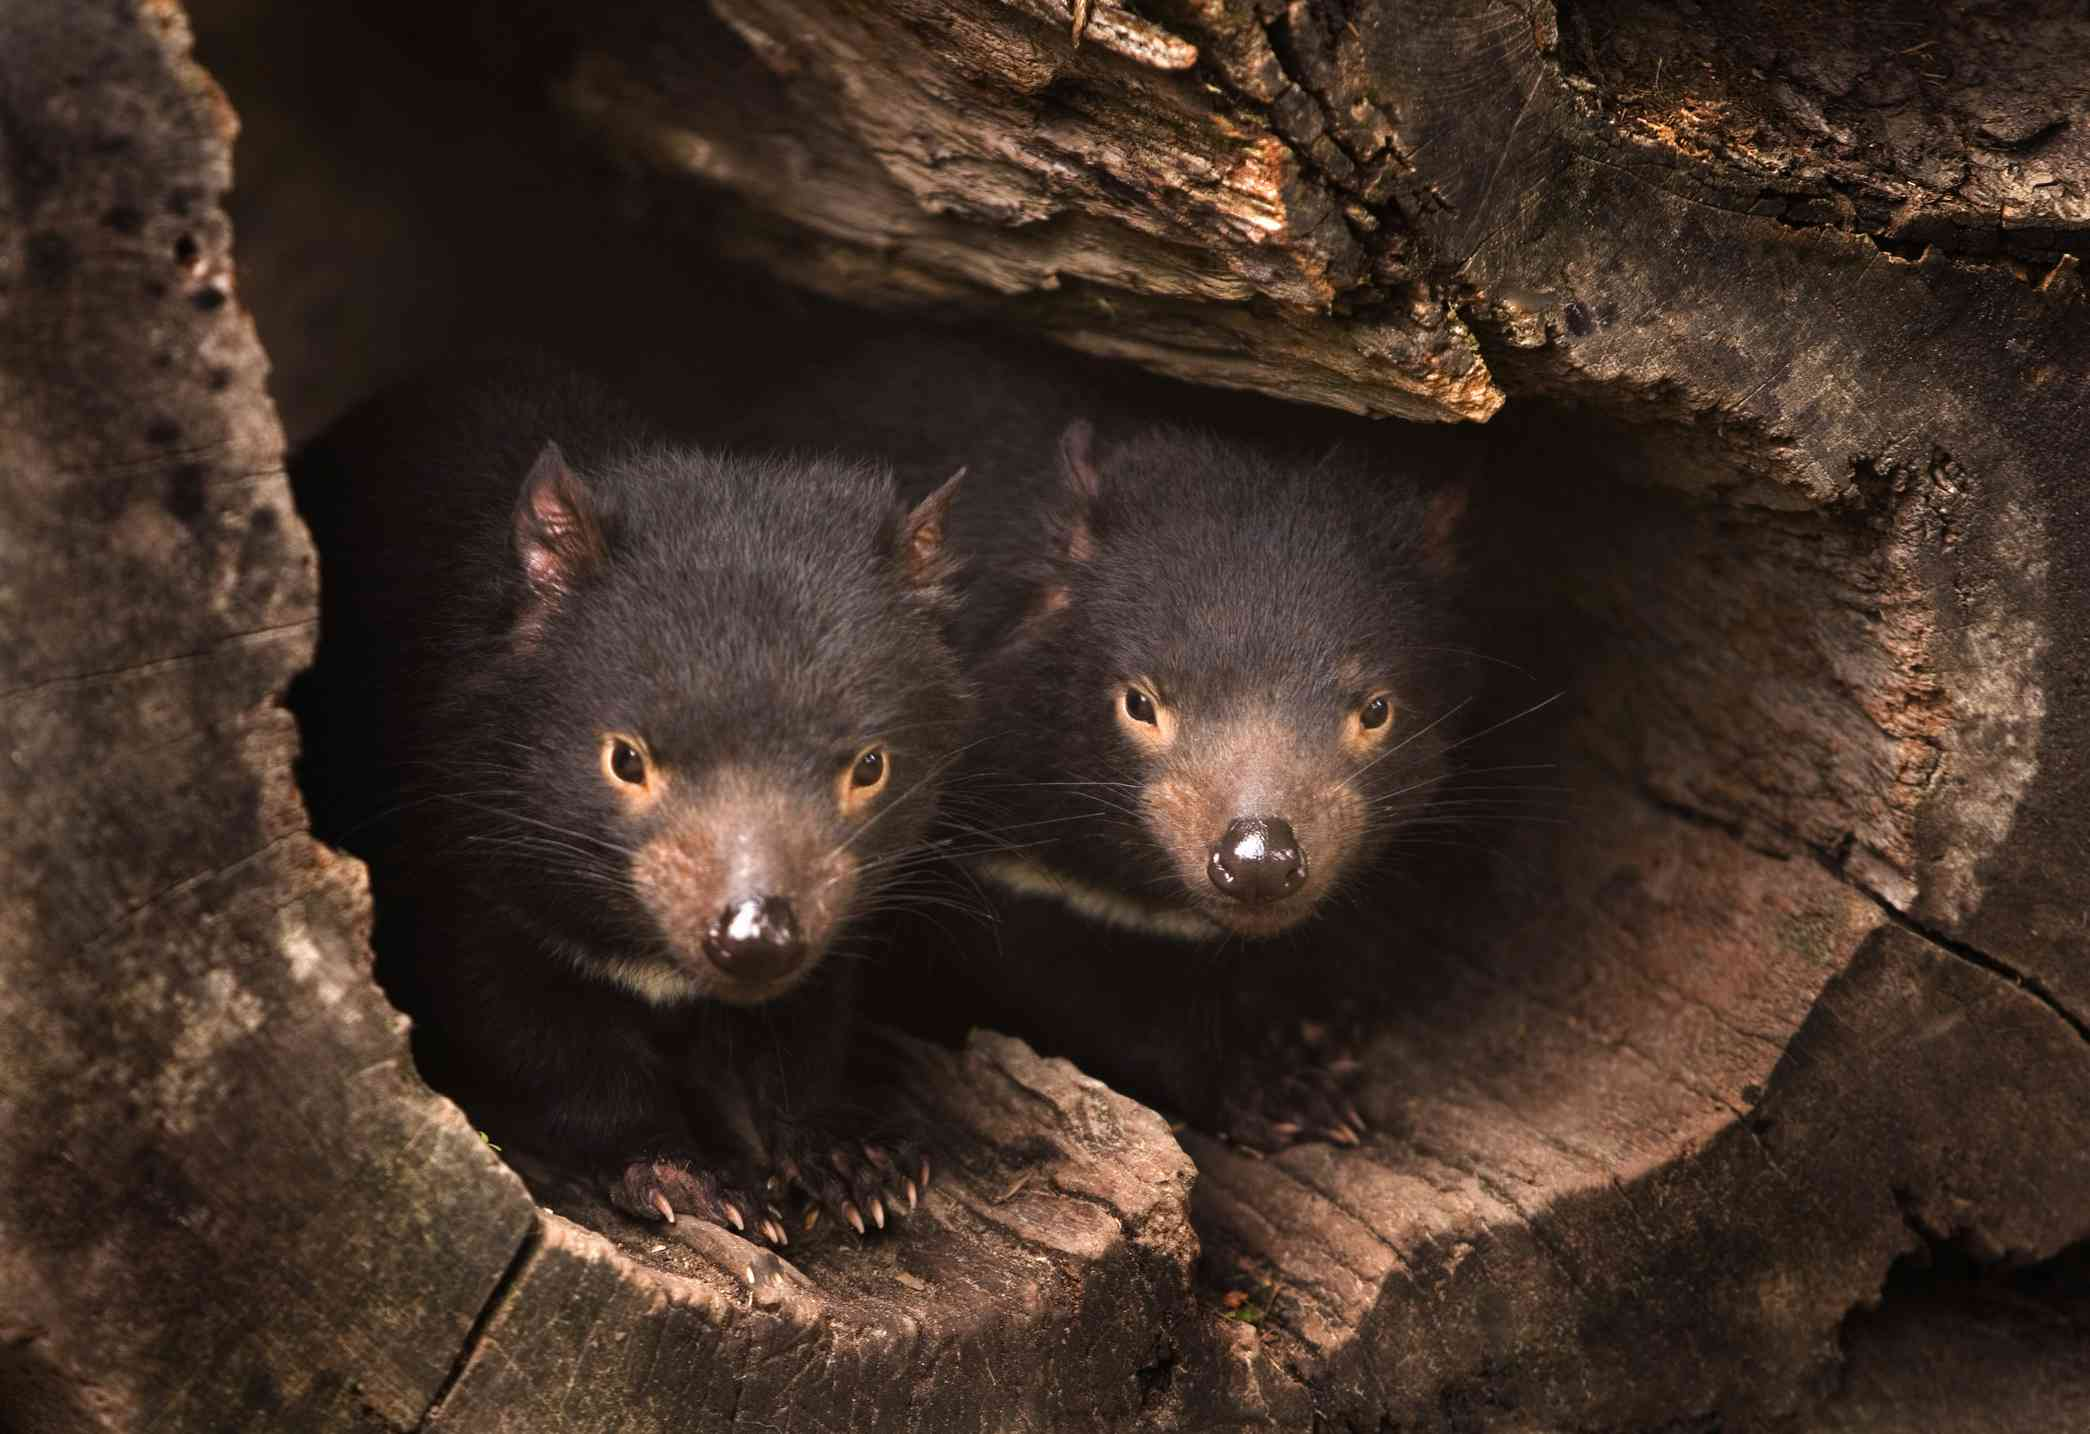 Two Tasmanian Devils in a hollow log